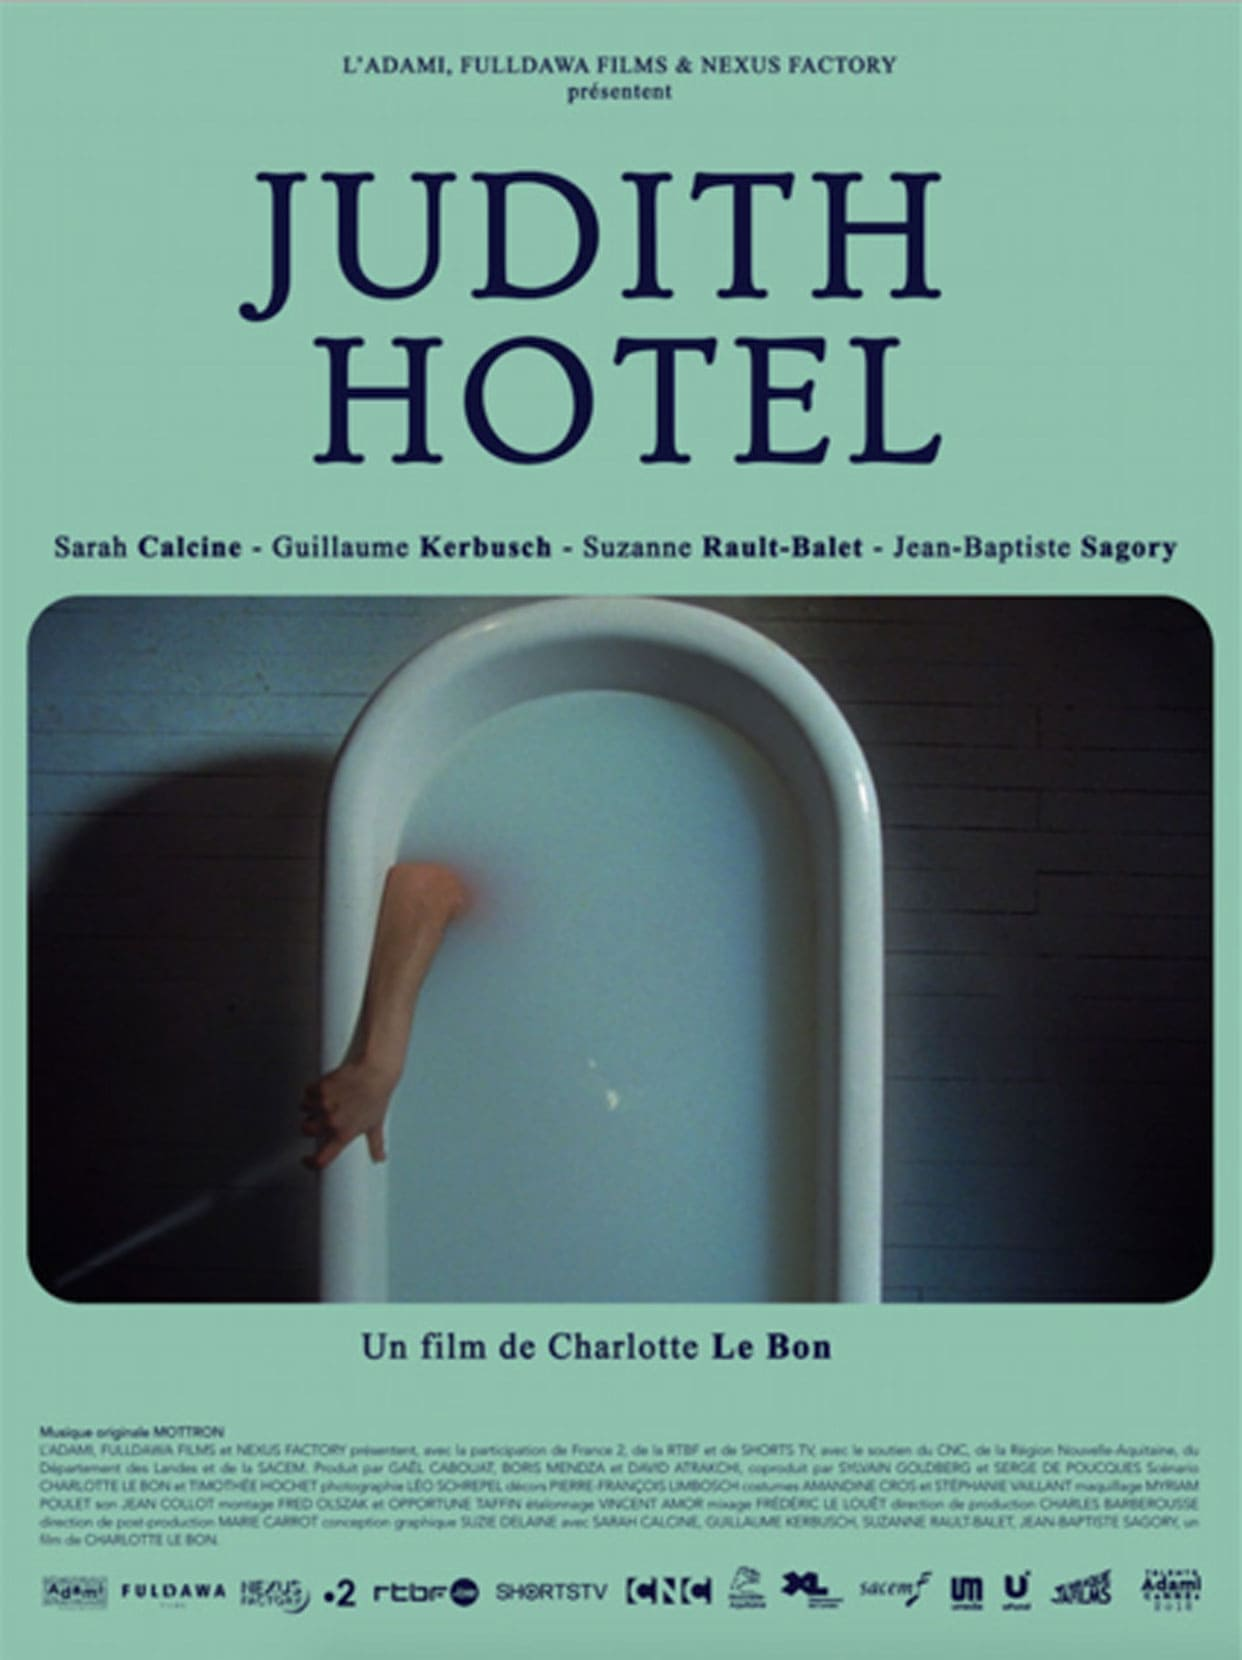 JUDIT-HOTEL-Charlotte-Le-Bon